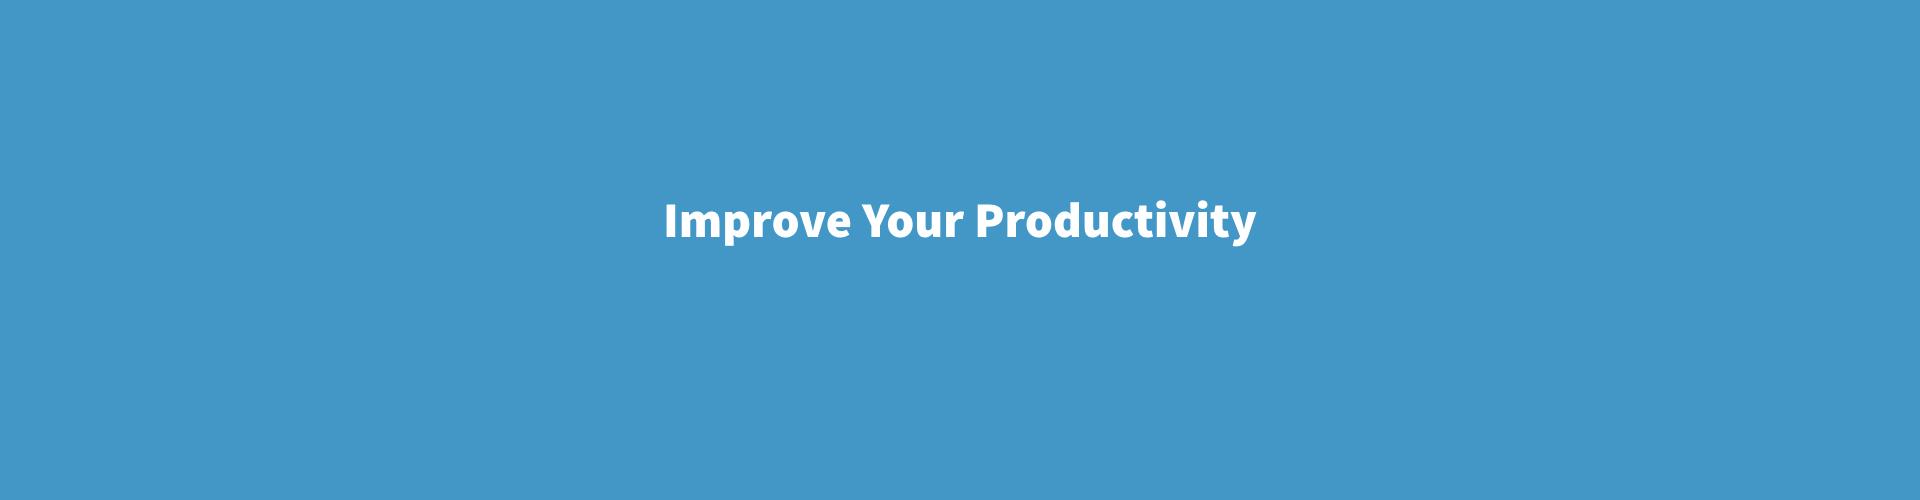 productivity.001.jpeg